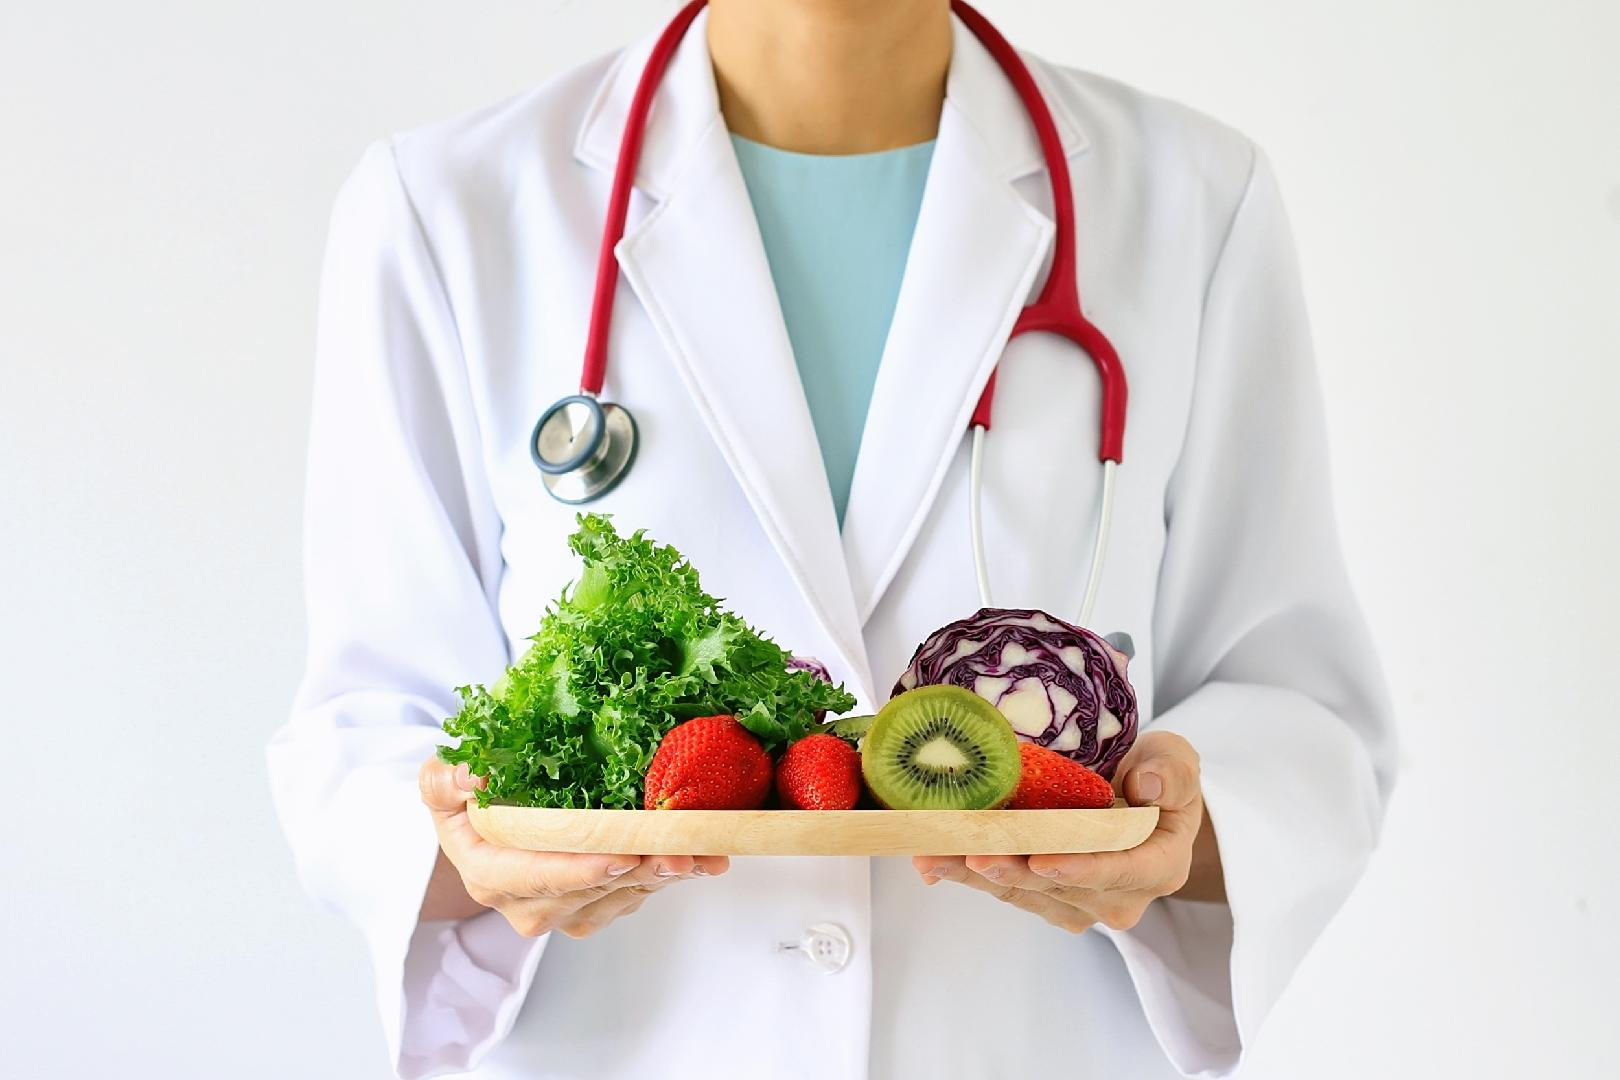 Doctors in California Are Prescribing Food as Medicine, and It's